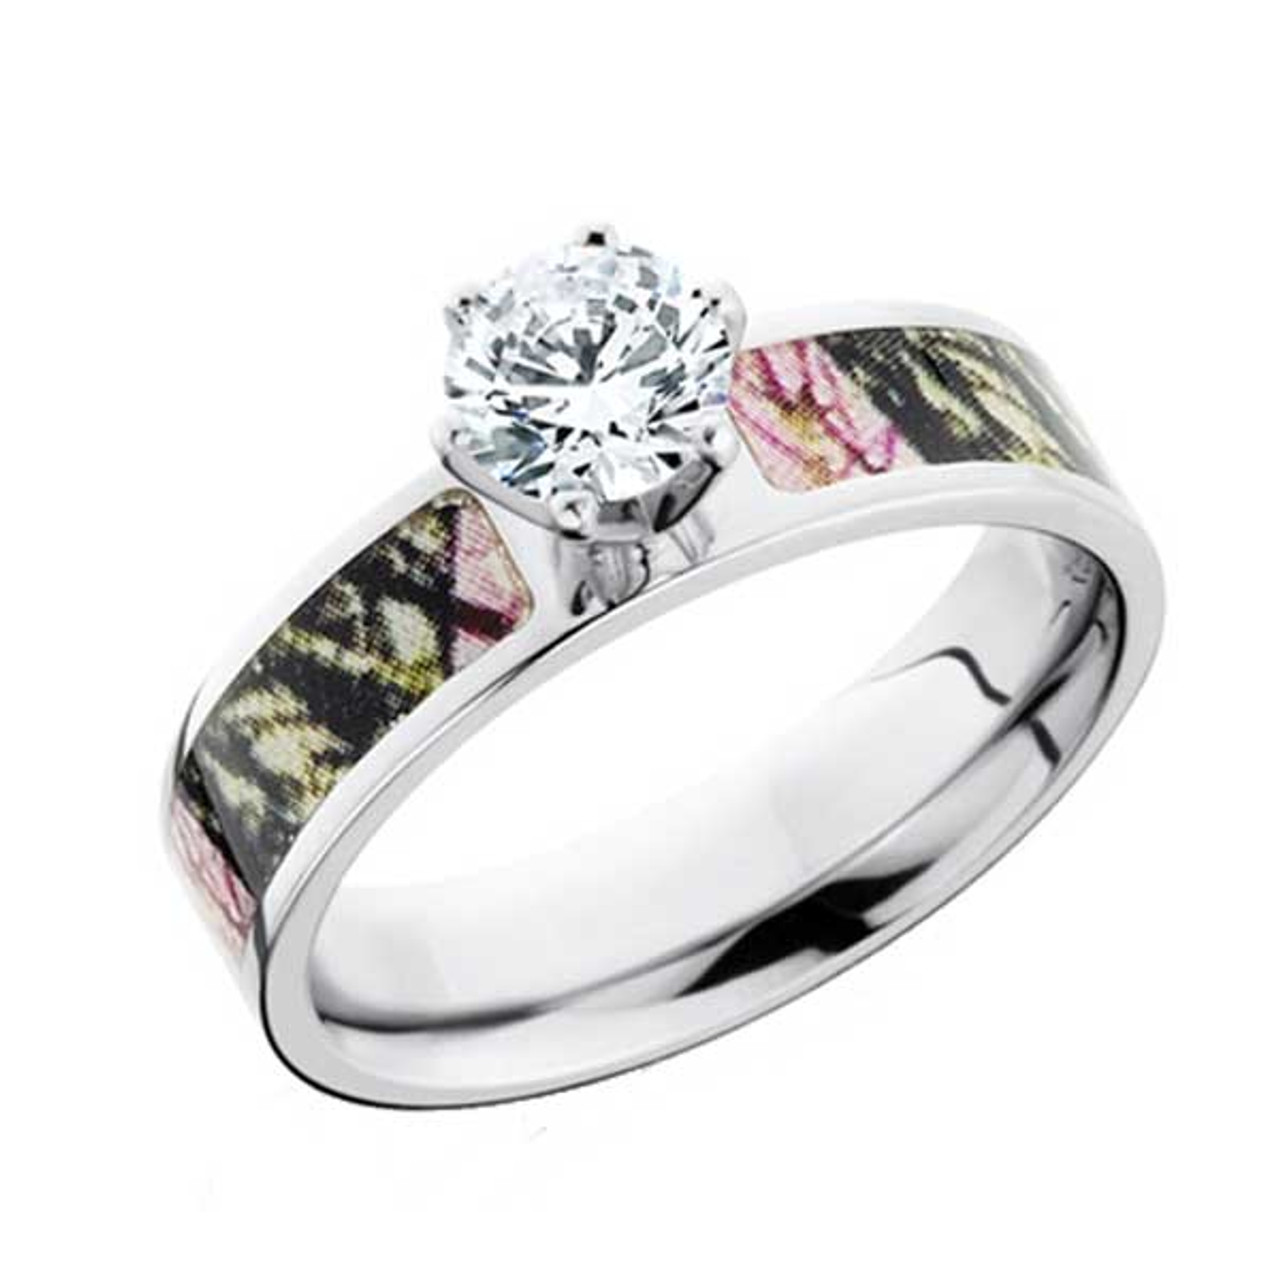 5ad7c8a6b CZ Camo Engagement Ring | Free Shipping | CAMOKIX